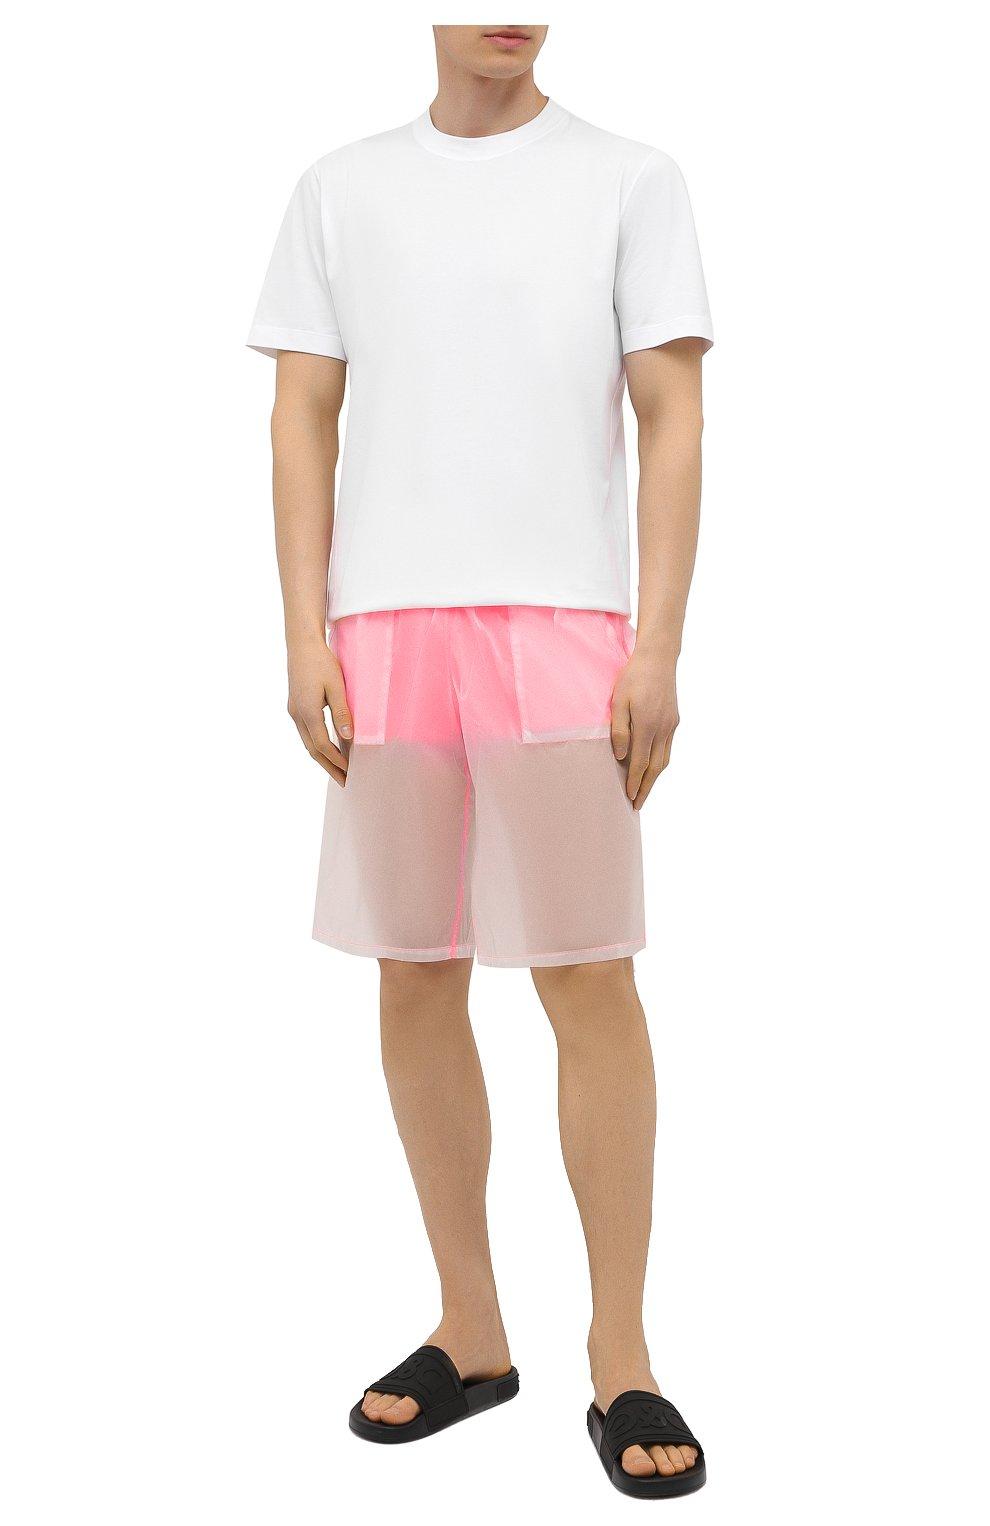 Мужские плавки-шорты MOSCHINO розового цвета, арт. A6164/2313   Фото 2 (Принт: Без принта; Материал внешний: Синтетический материал; Мужское Кросс-КТ: плавки-шорты)